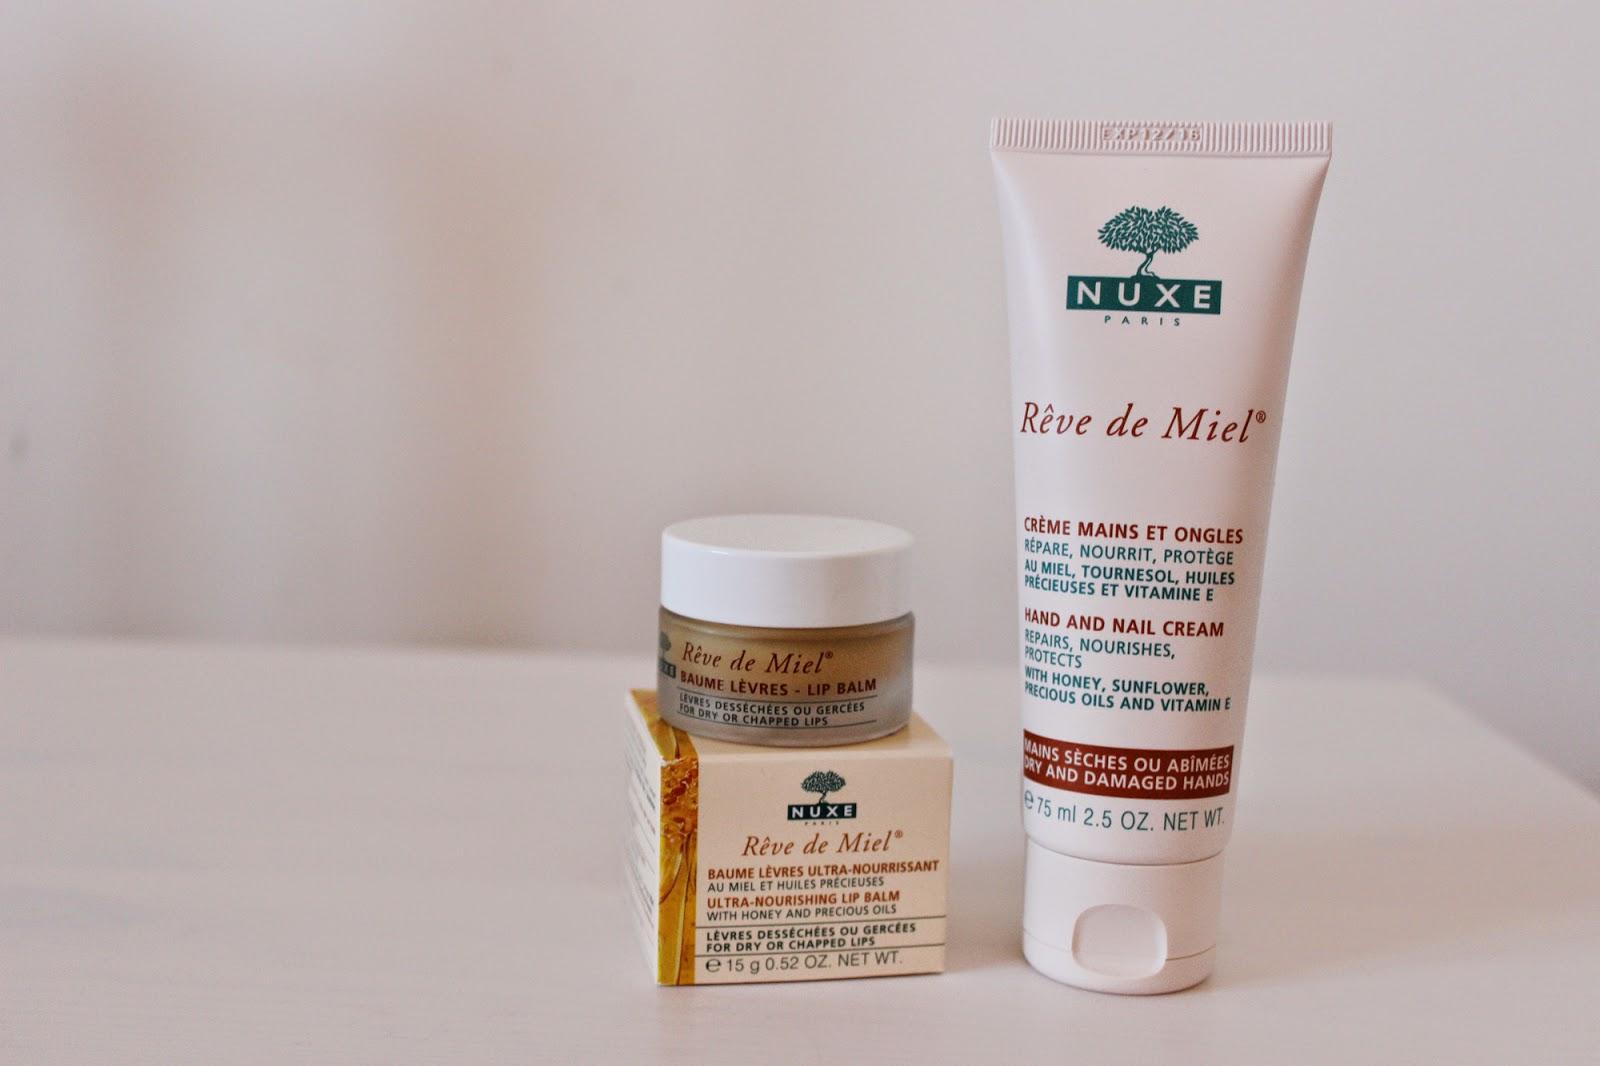 Nuxe Reve De Miel Lip Balm & Hand Cream Review - Zoey Olivia